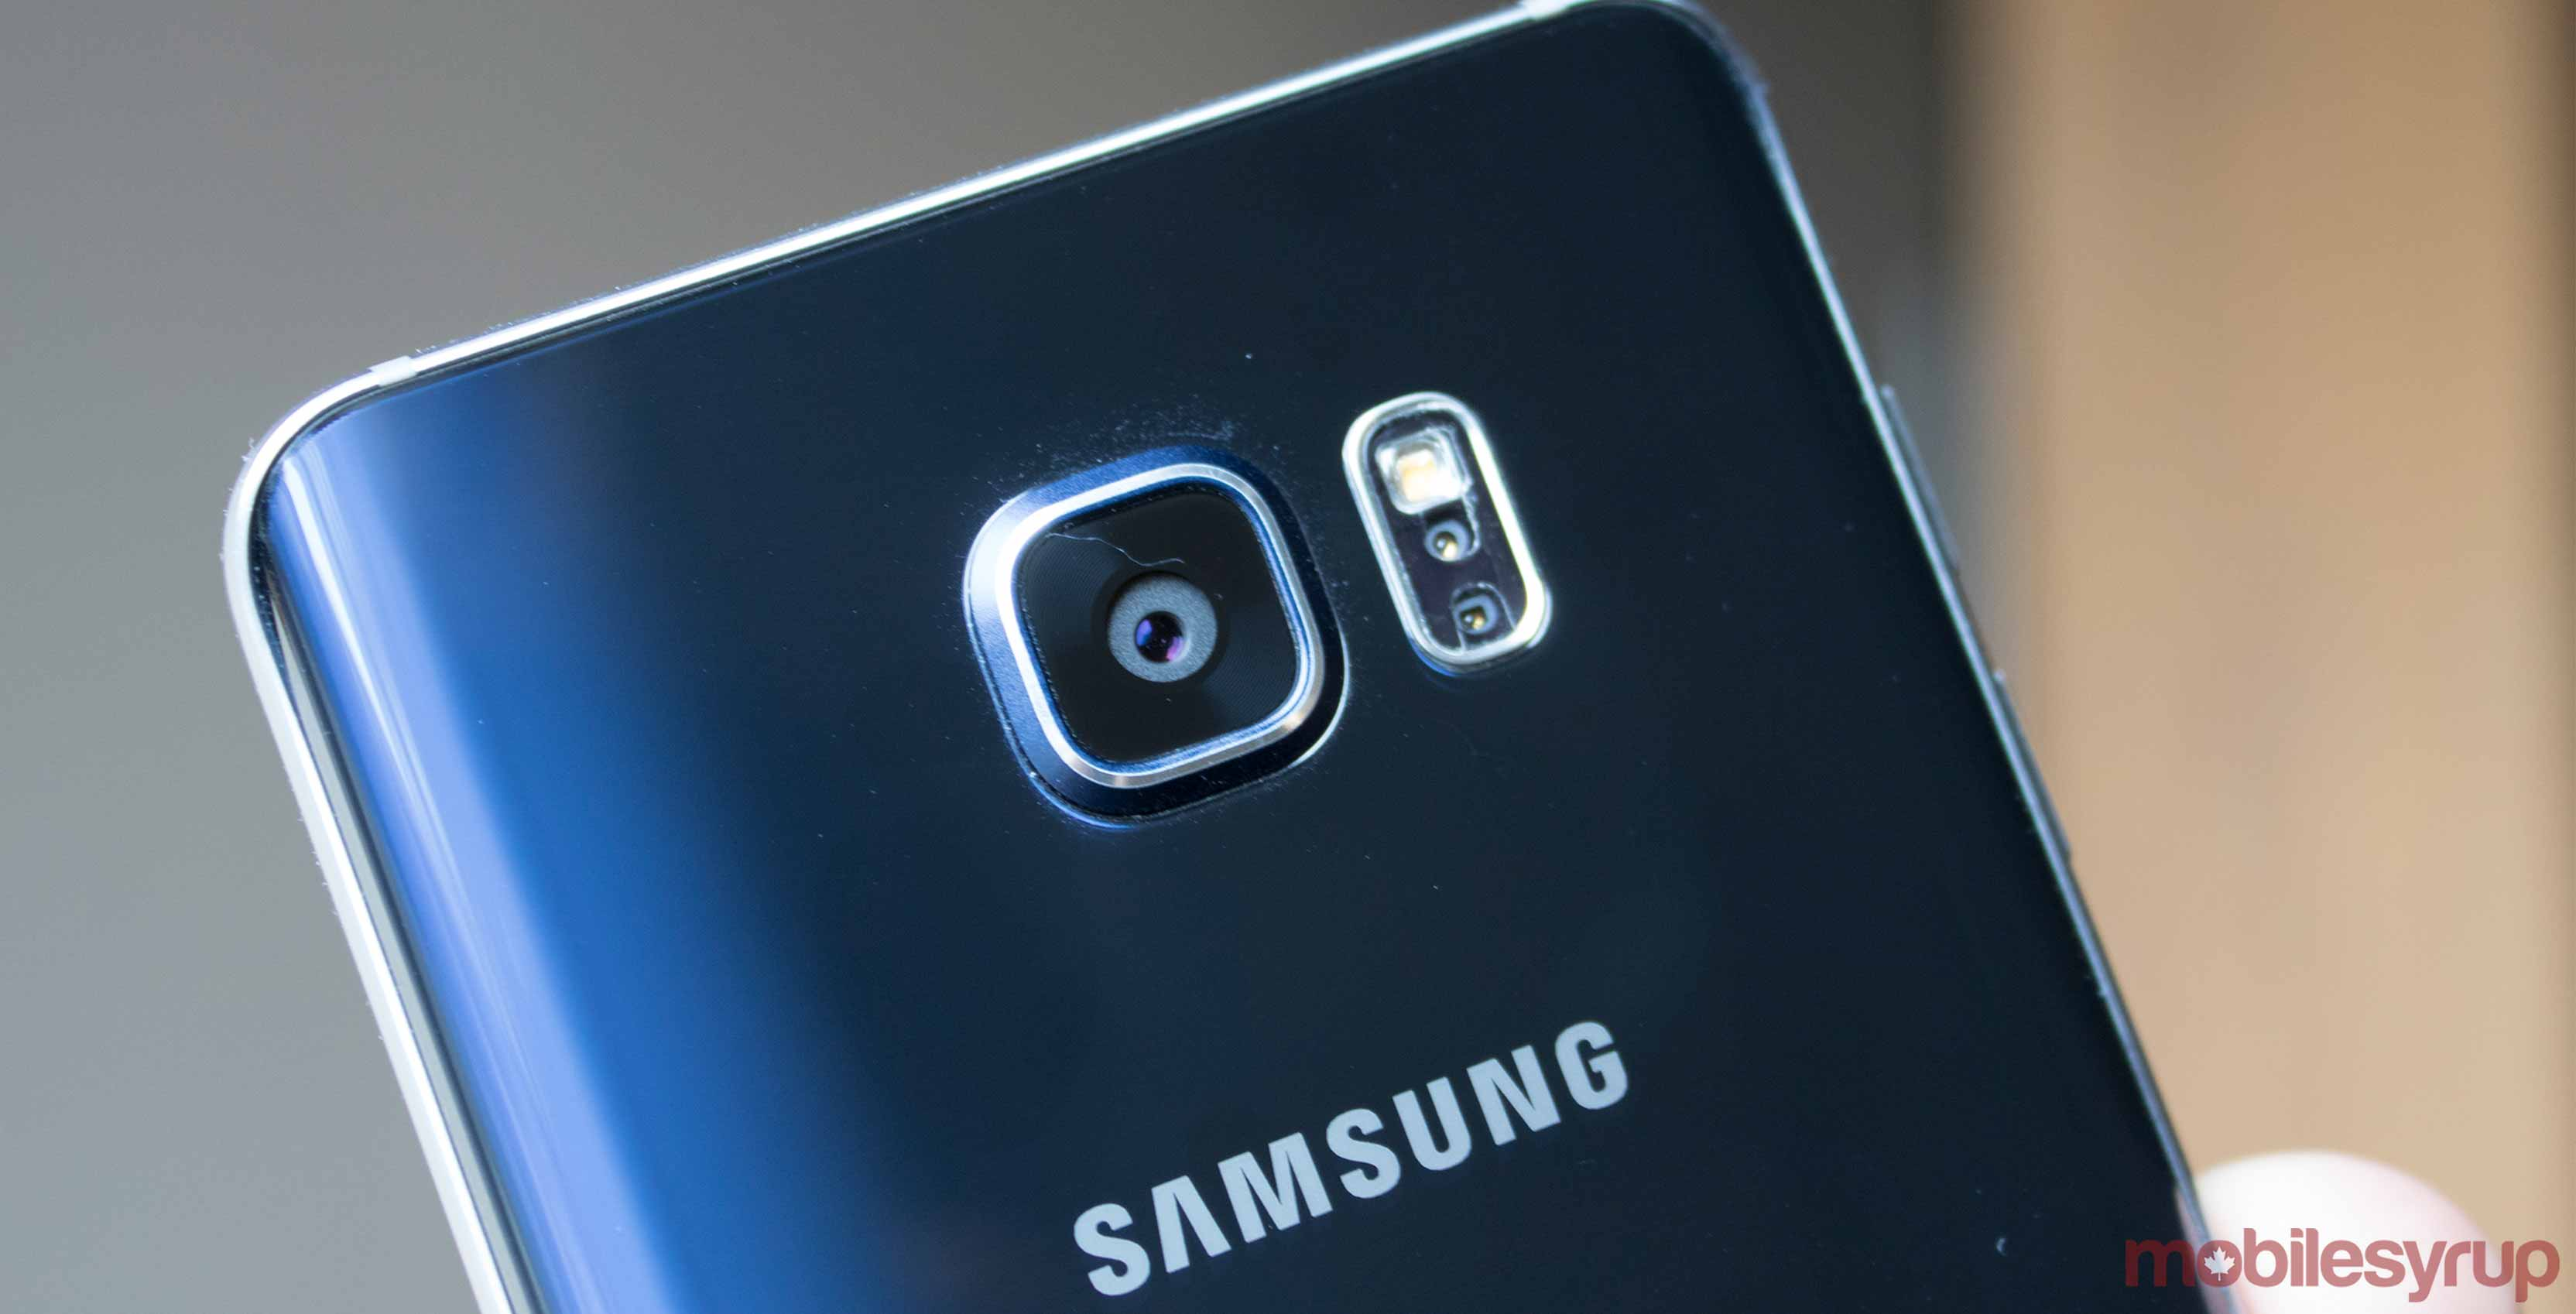 Galaxy S7 price drop